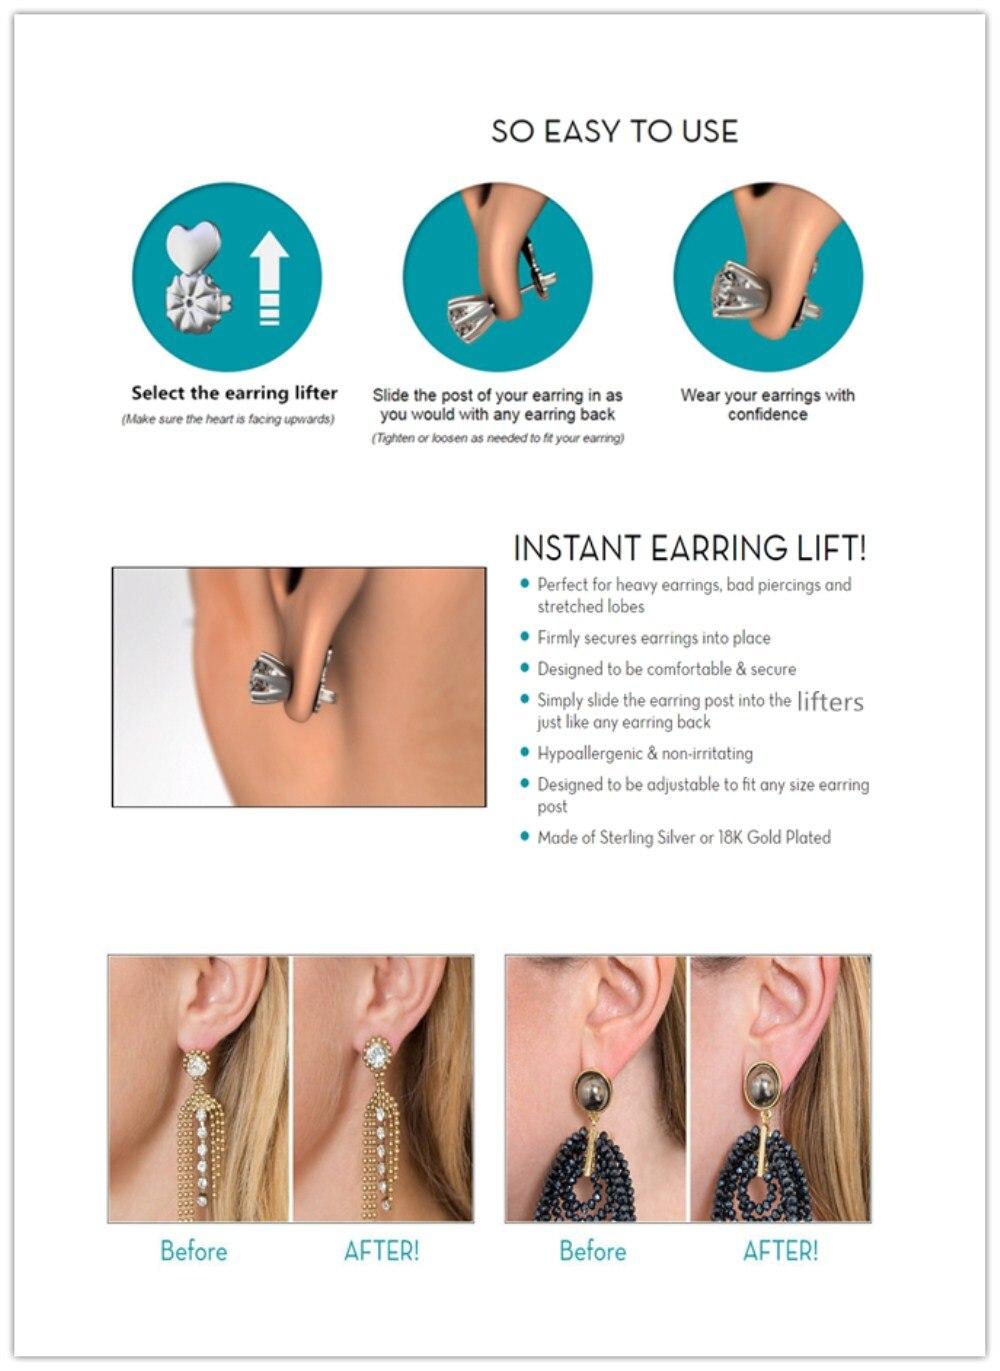 Instant earring lift-instruction